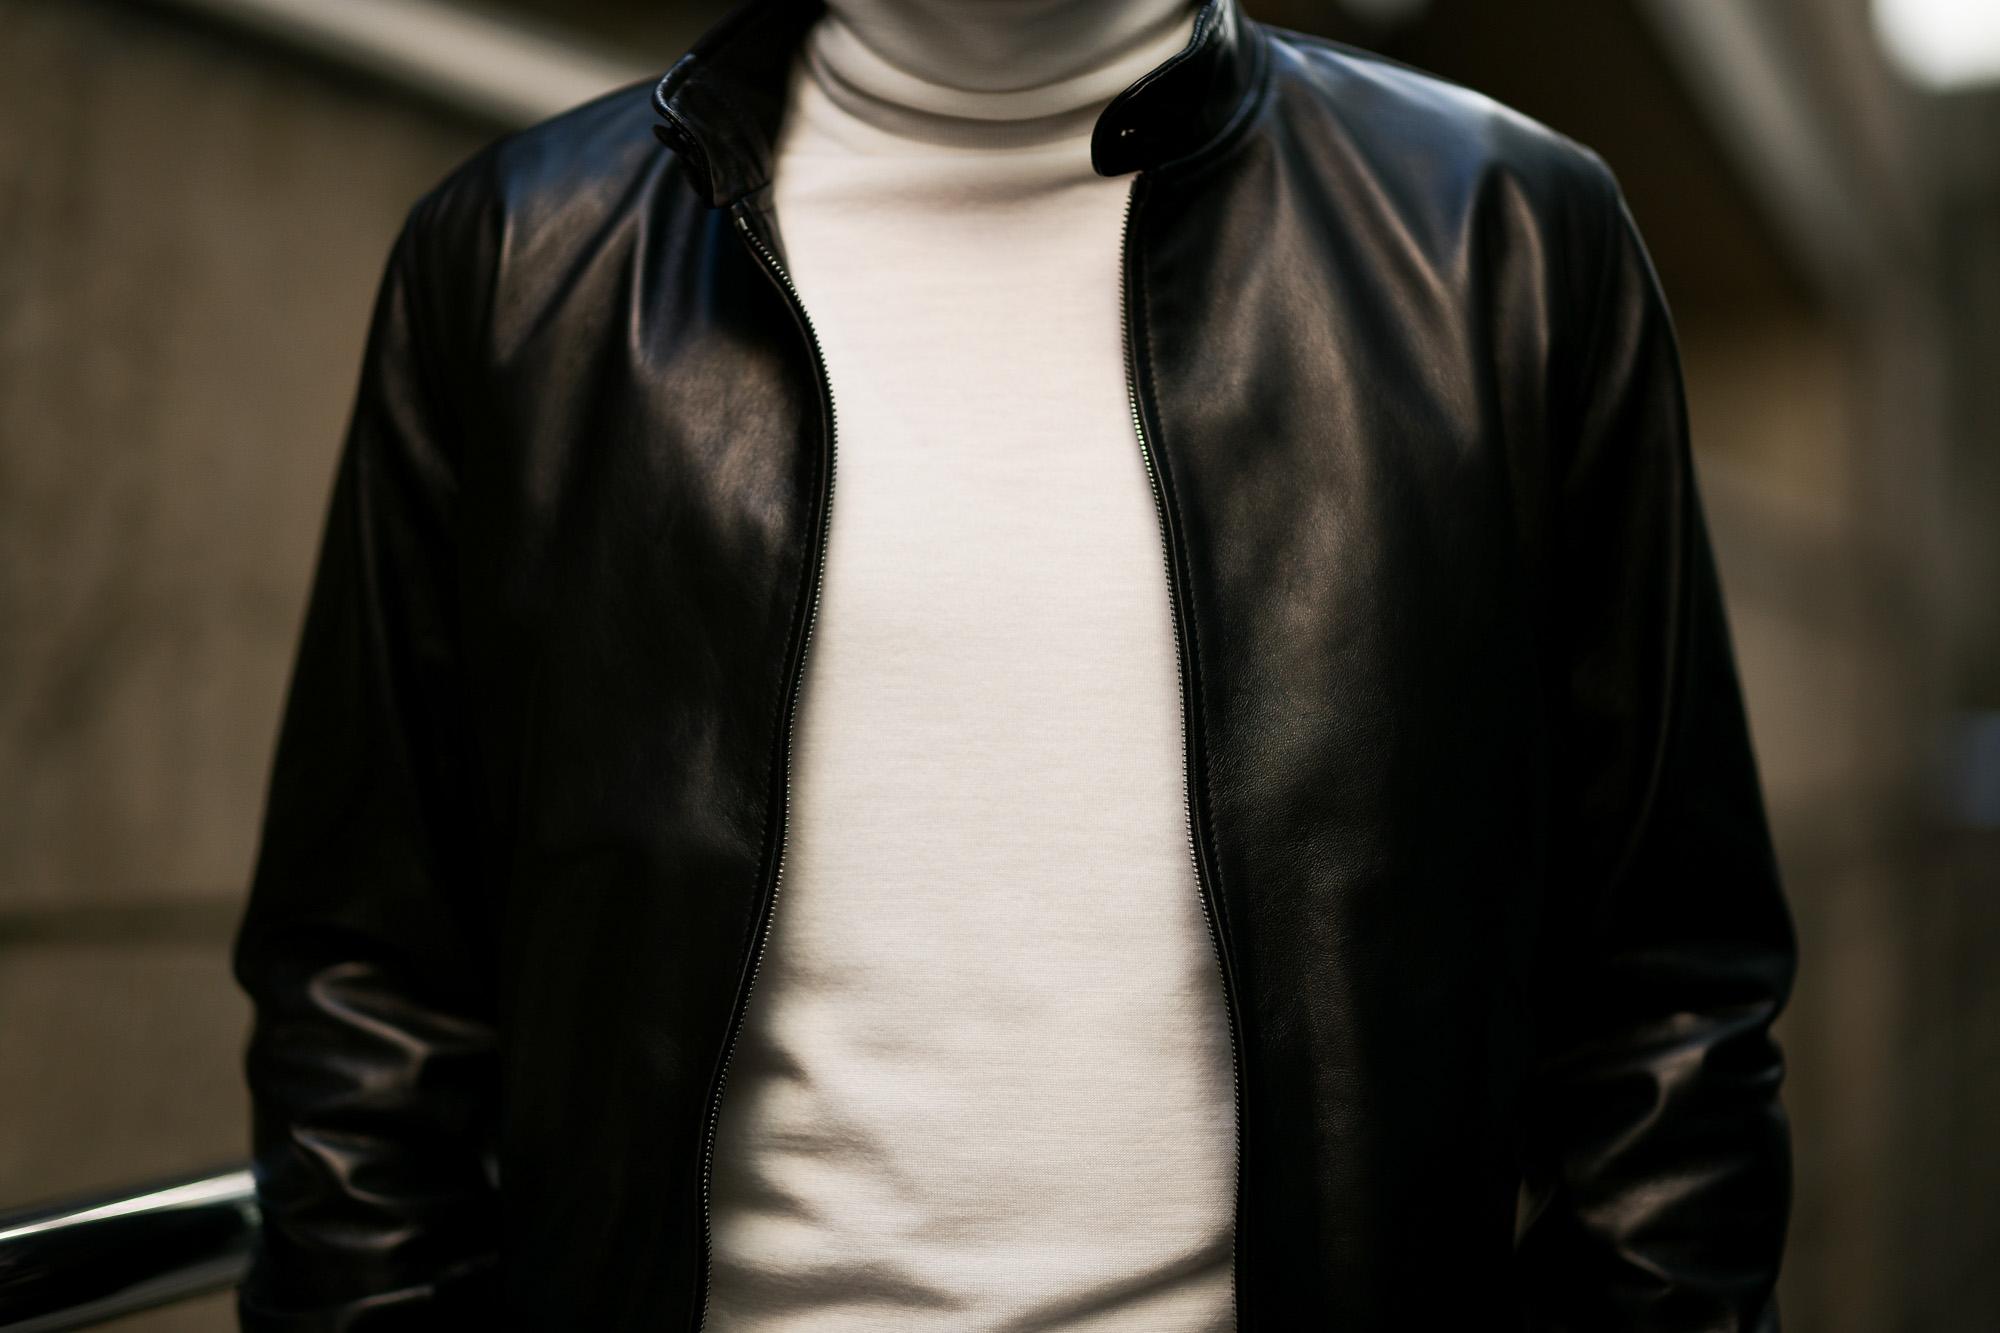 SILENCE (サイレンス) Single Rib Leather Jacket (シングル リブ レザー ジャケット) Lambskin Nappa Leather (ラムナッパ レザー) シングル ライダース ジャケット NERO (ブラック) Made in italy (イタリア製) 2019 春夏新作  愛知 名古屋 東京 大阪 alto e diritto アルトエデリット altoediritto